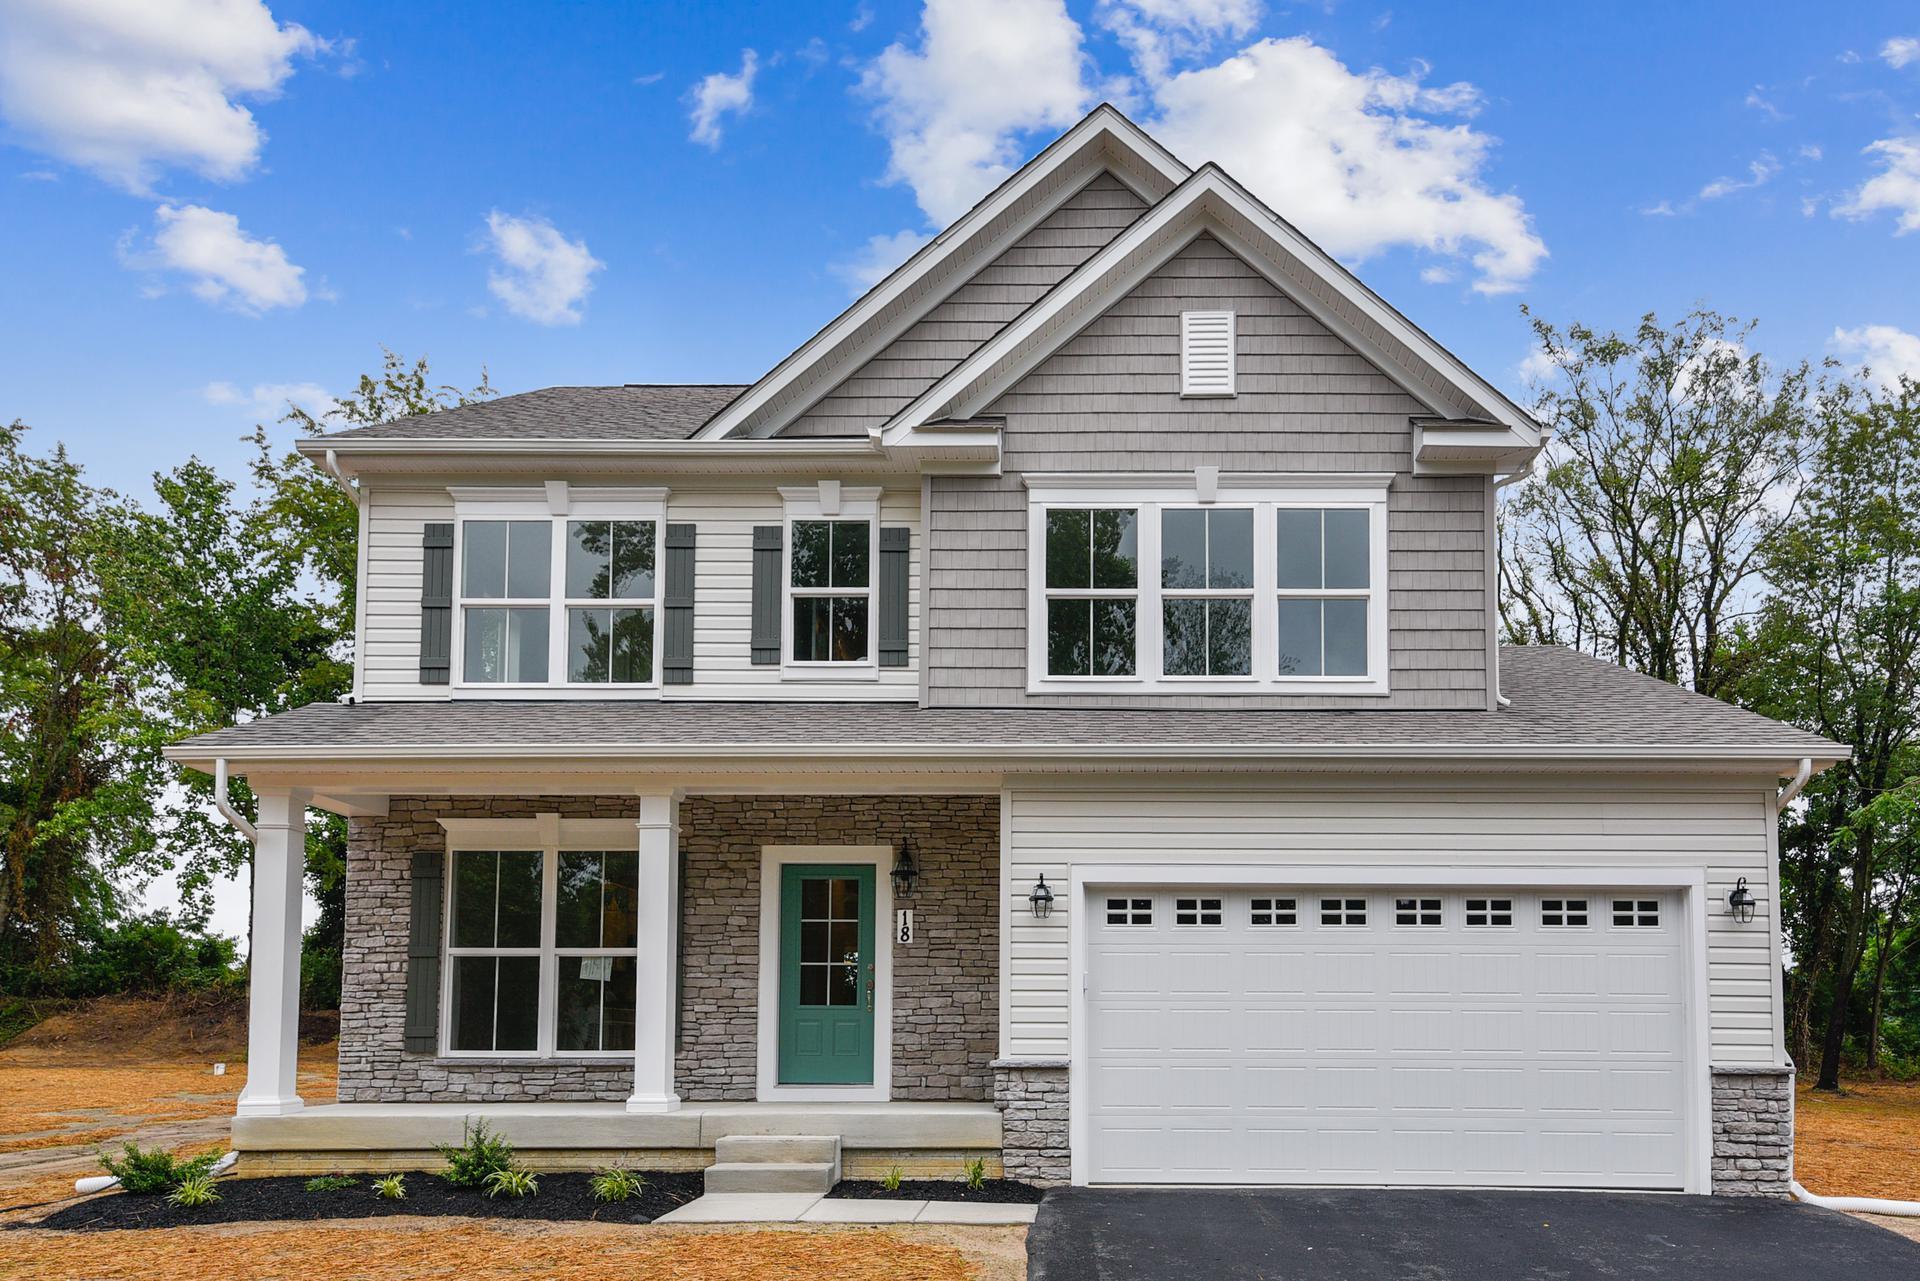 Deerfield New Home in Maryland